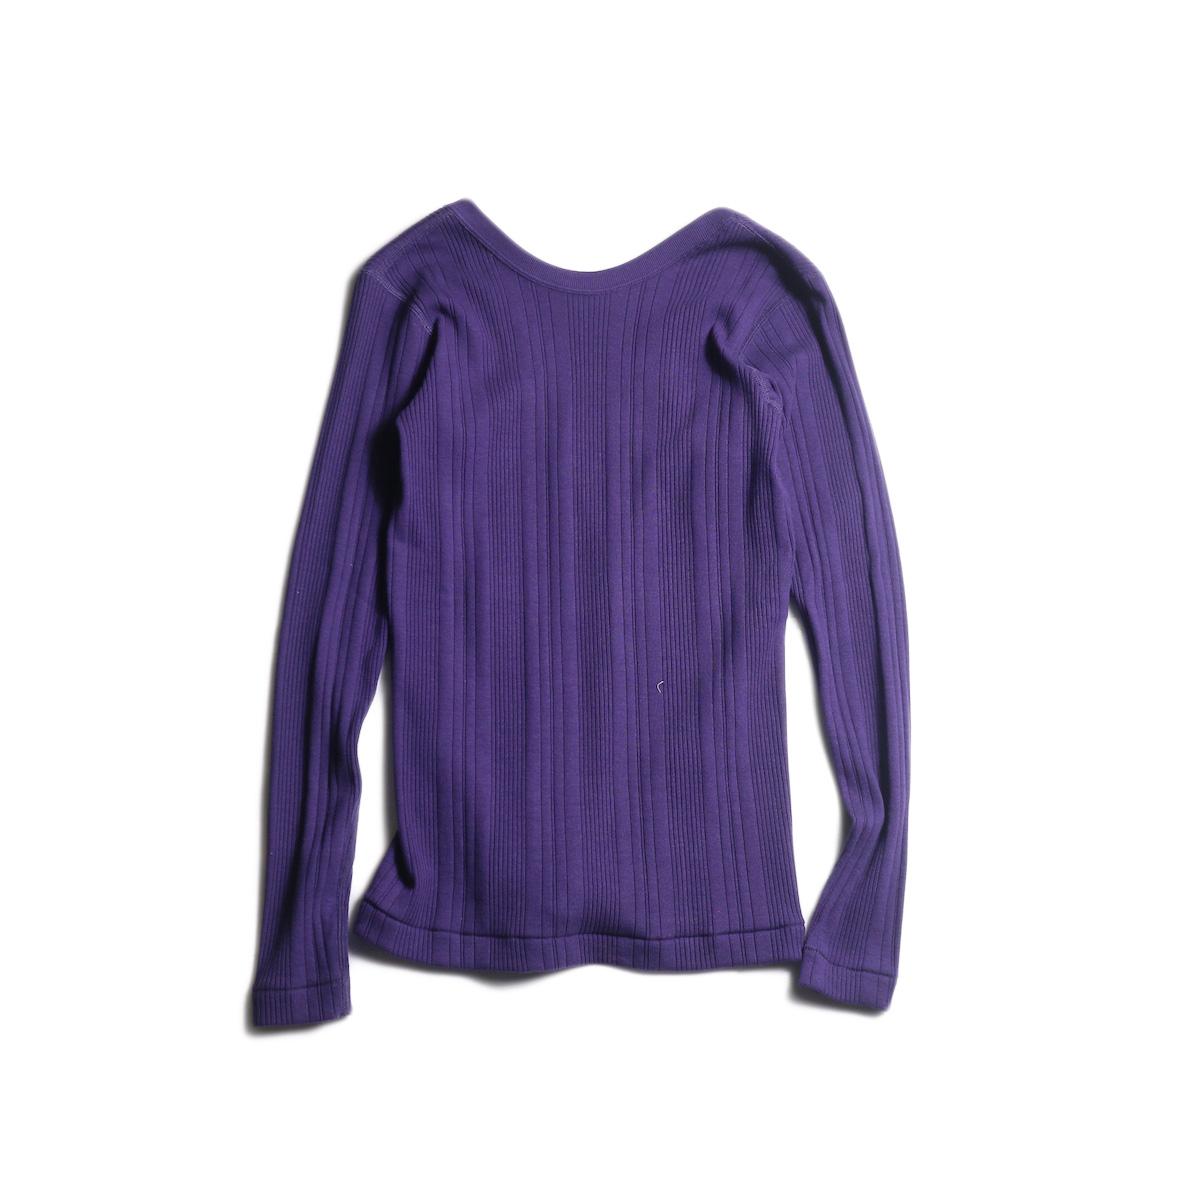 JANE SMITH / BACK OPEN PULLOVER (Purple)